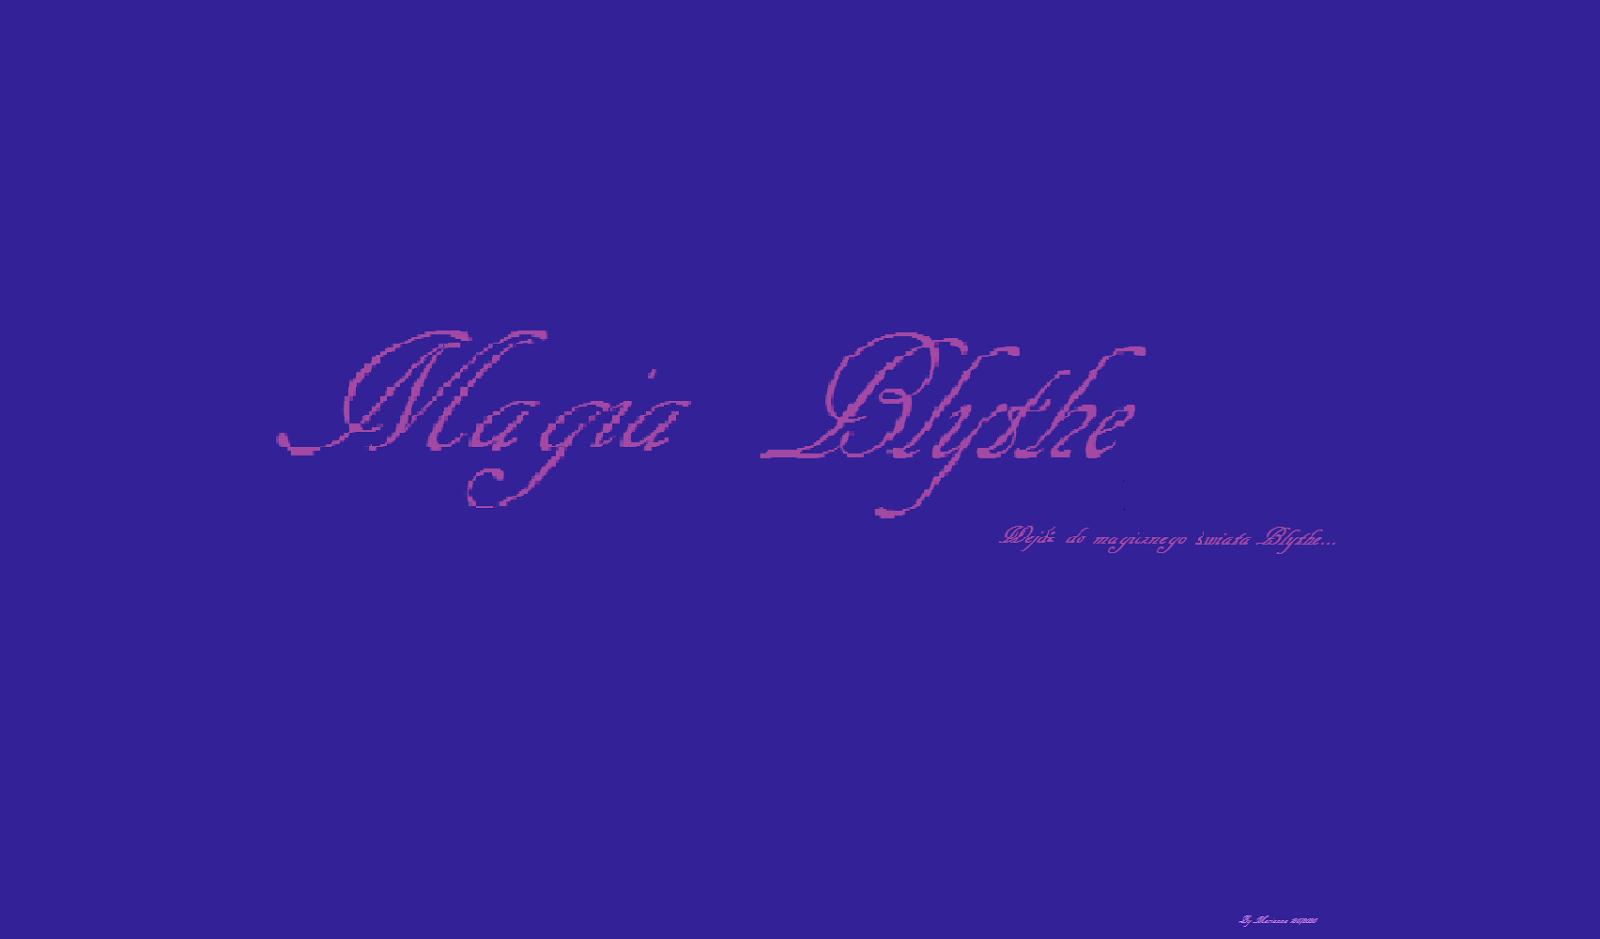 Magia Blythe